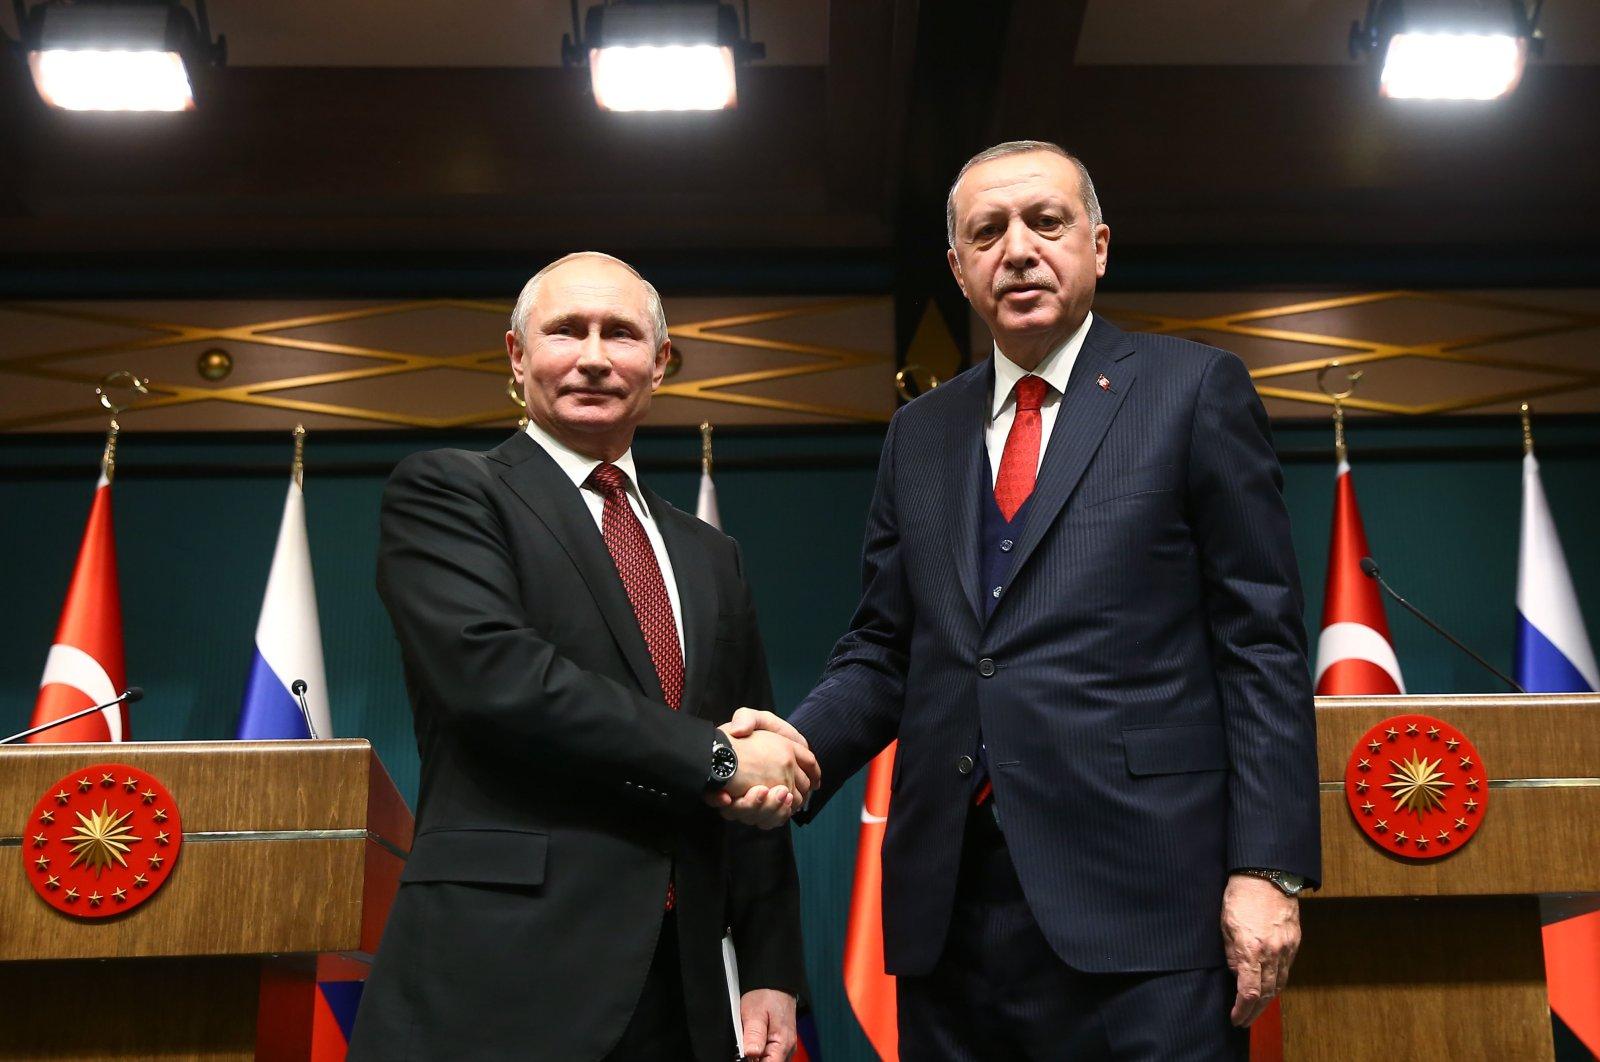 President Recep Tayyip Erdoğan shakes hands with Russian President Vladimir Putin in Ankara, Turkey, April 3, 2018. (Courtesy of Turkish Presidency)